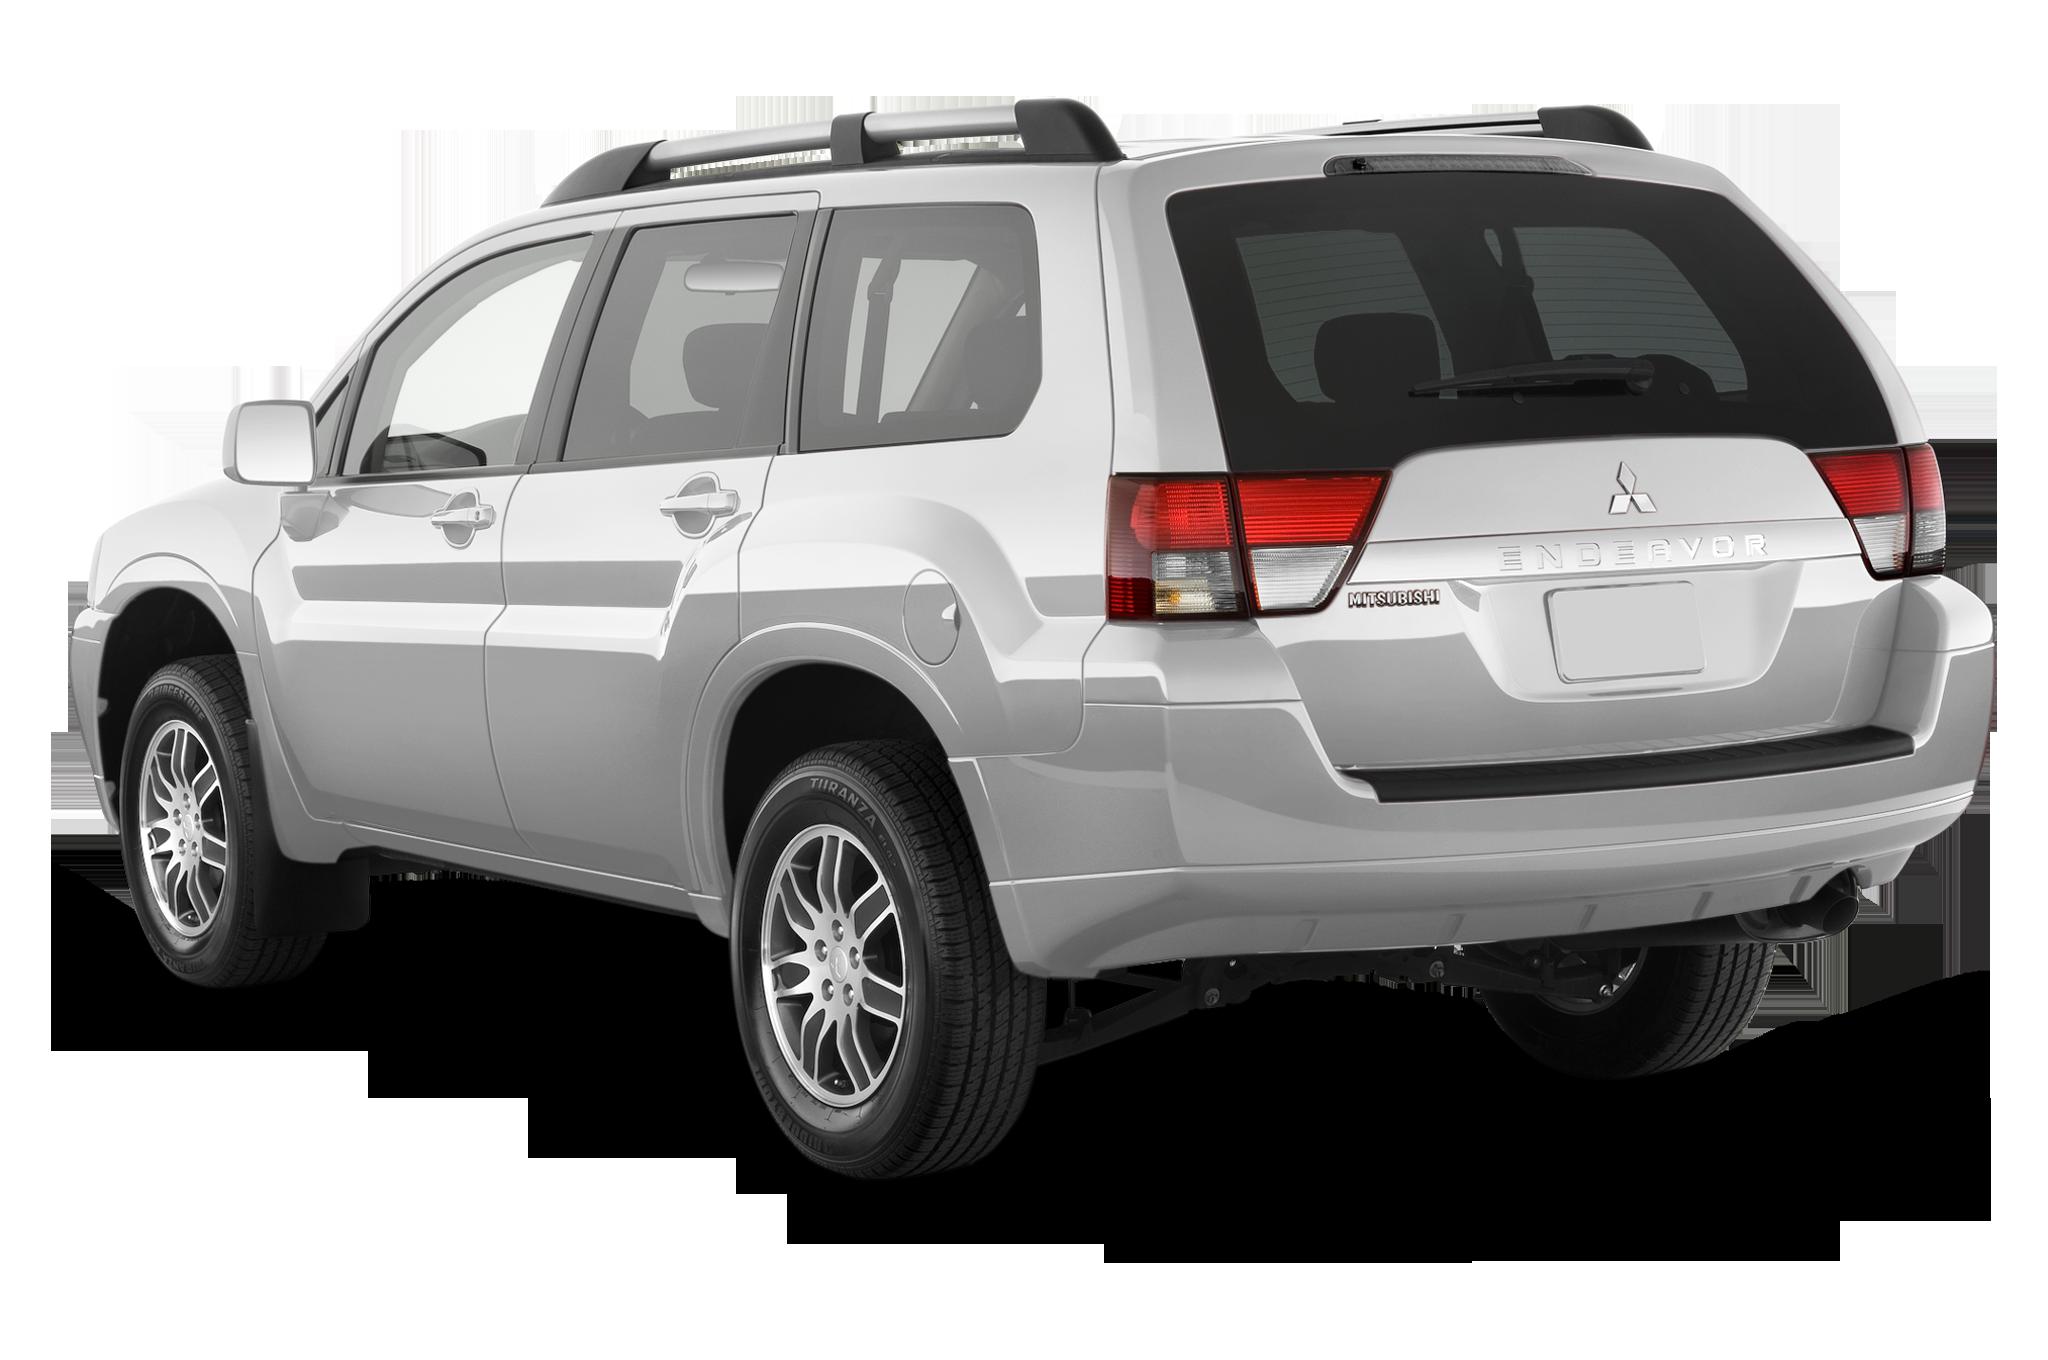 Mitsubishi Endeavor 2003 2011 Suv 5 Door Outstanding Cars Wiring Harness 2006 Endevour 4